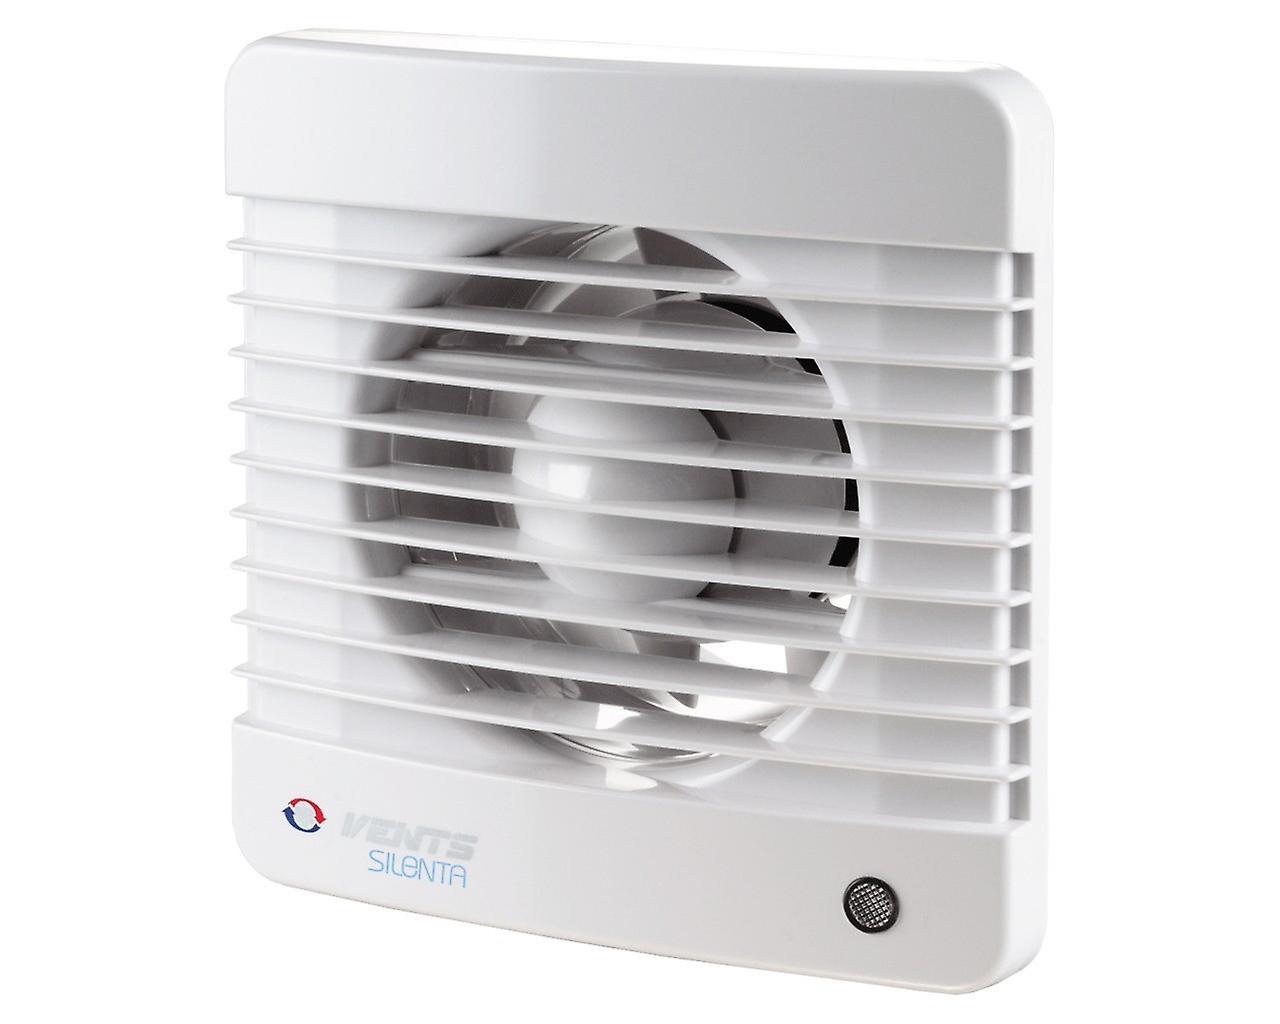 Vents Fan Energy Saving Bathroom Fan 125 Silenta-S Series to 148 m³//h ip34